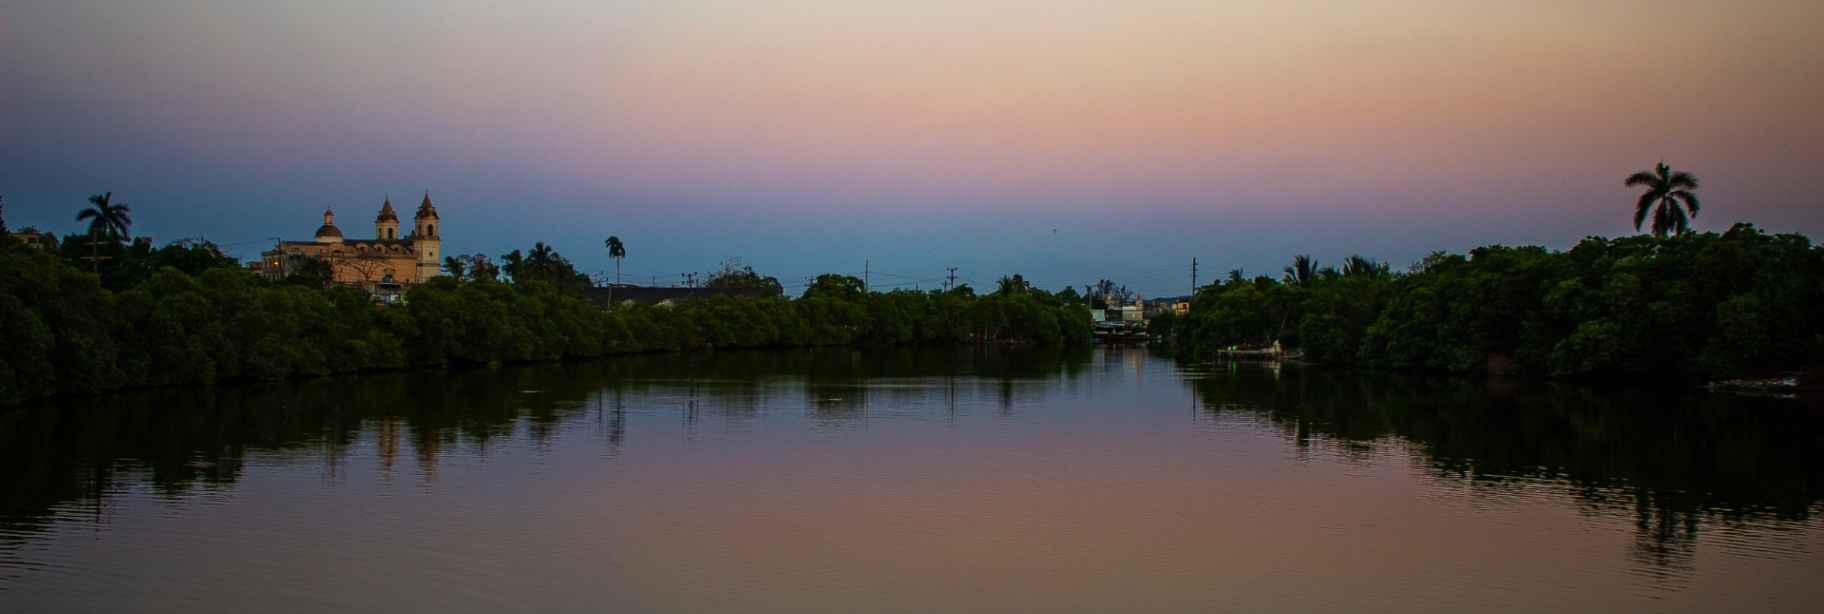 Obra: Río Yumurí, Matanzas